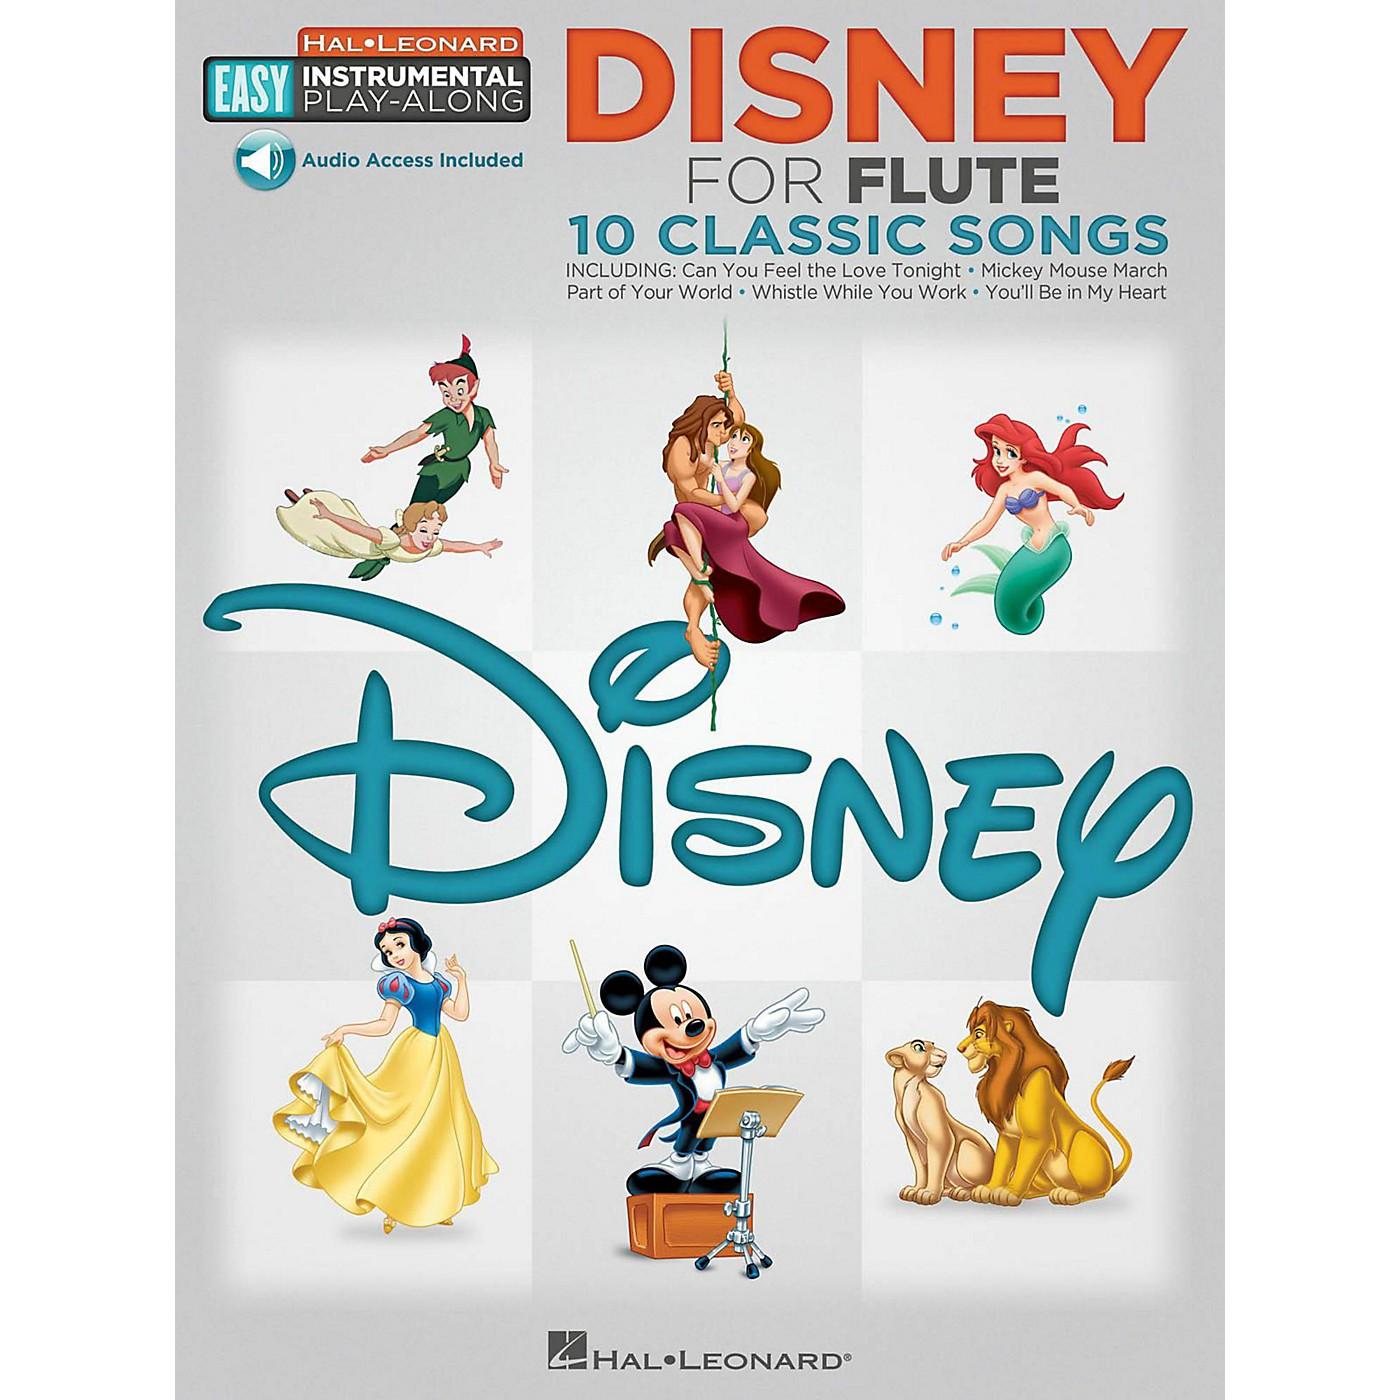 Hal Leonard Disney - Flute - Easy Instrumental Play-Along Book with Online Audio Tracks thumbnail